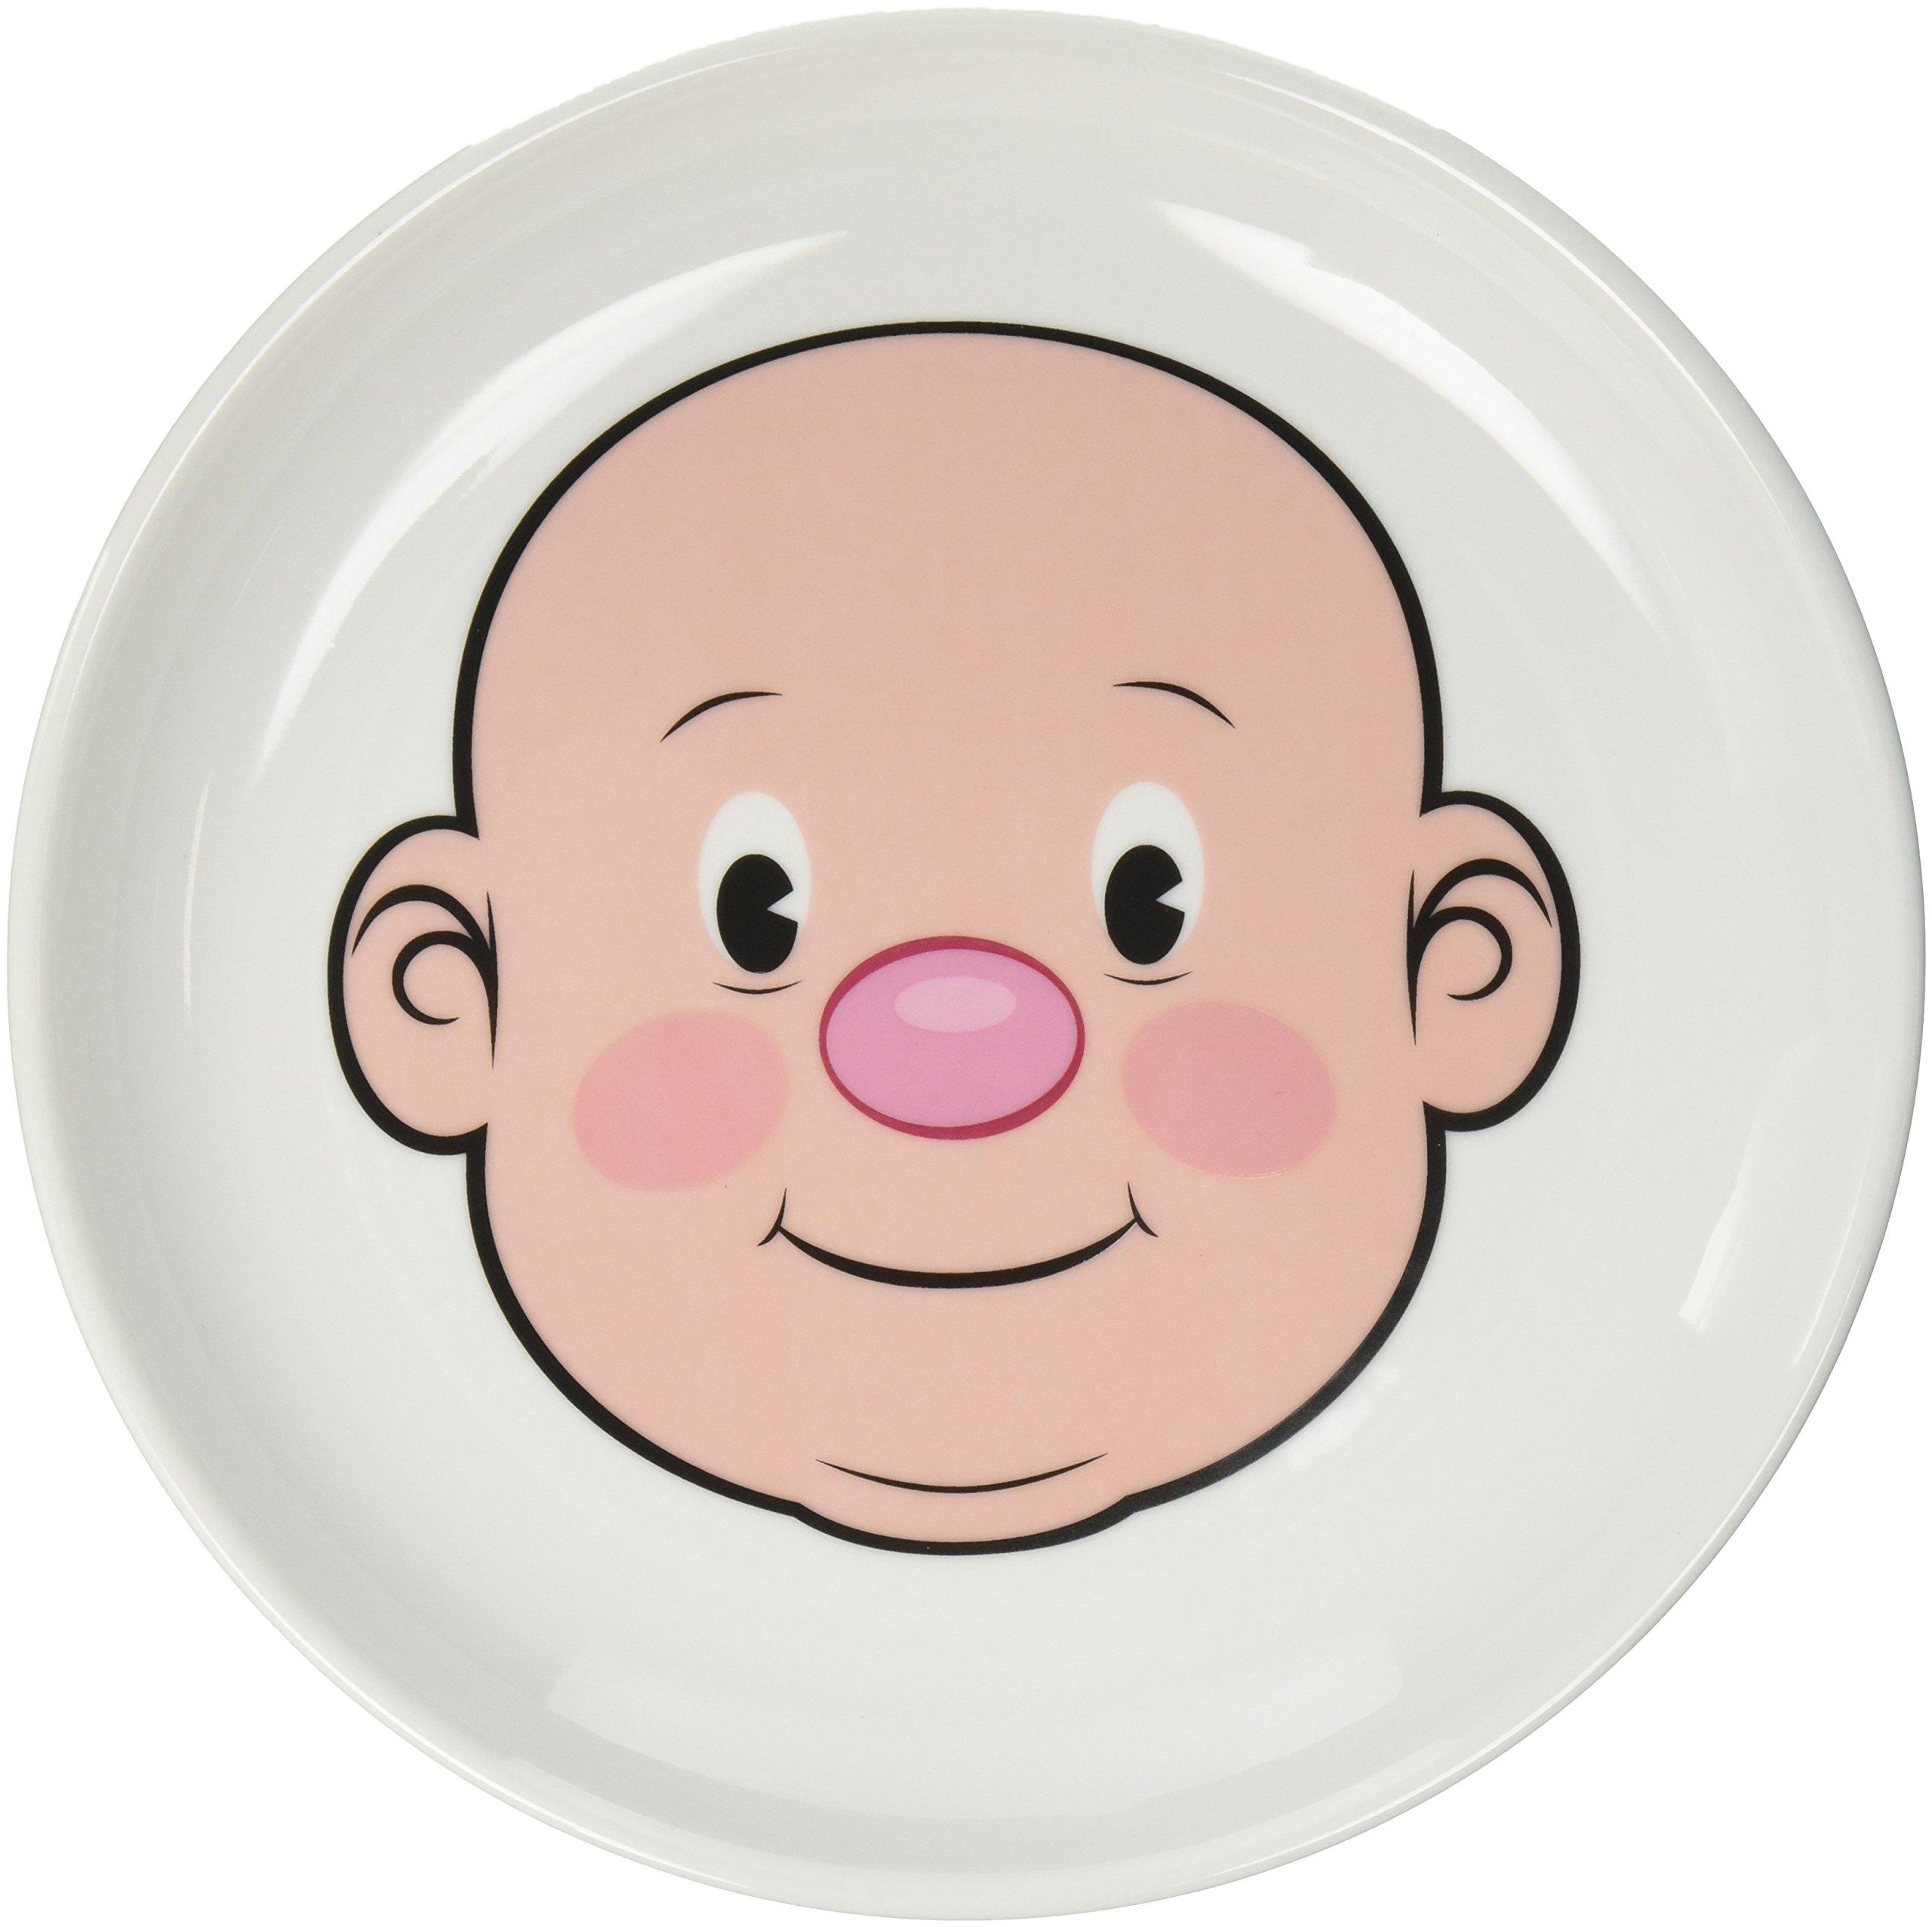 FOOD FACE Kids\u0027 Ceramic Dinner Plate  sc 1 st  eBay & Fred MR. FOOD FACE Kids\u0027 Ceramic Dinner Plate | eBay